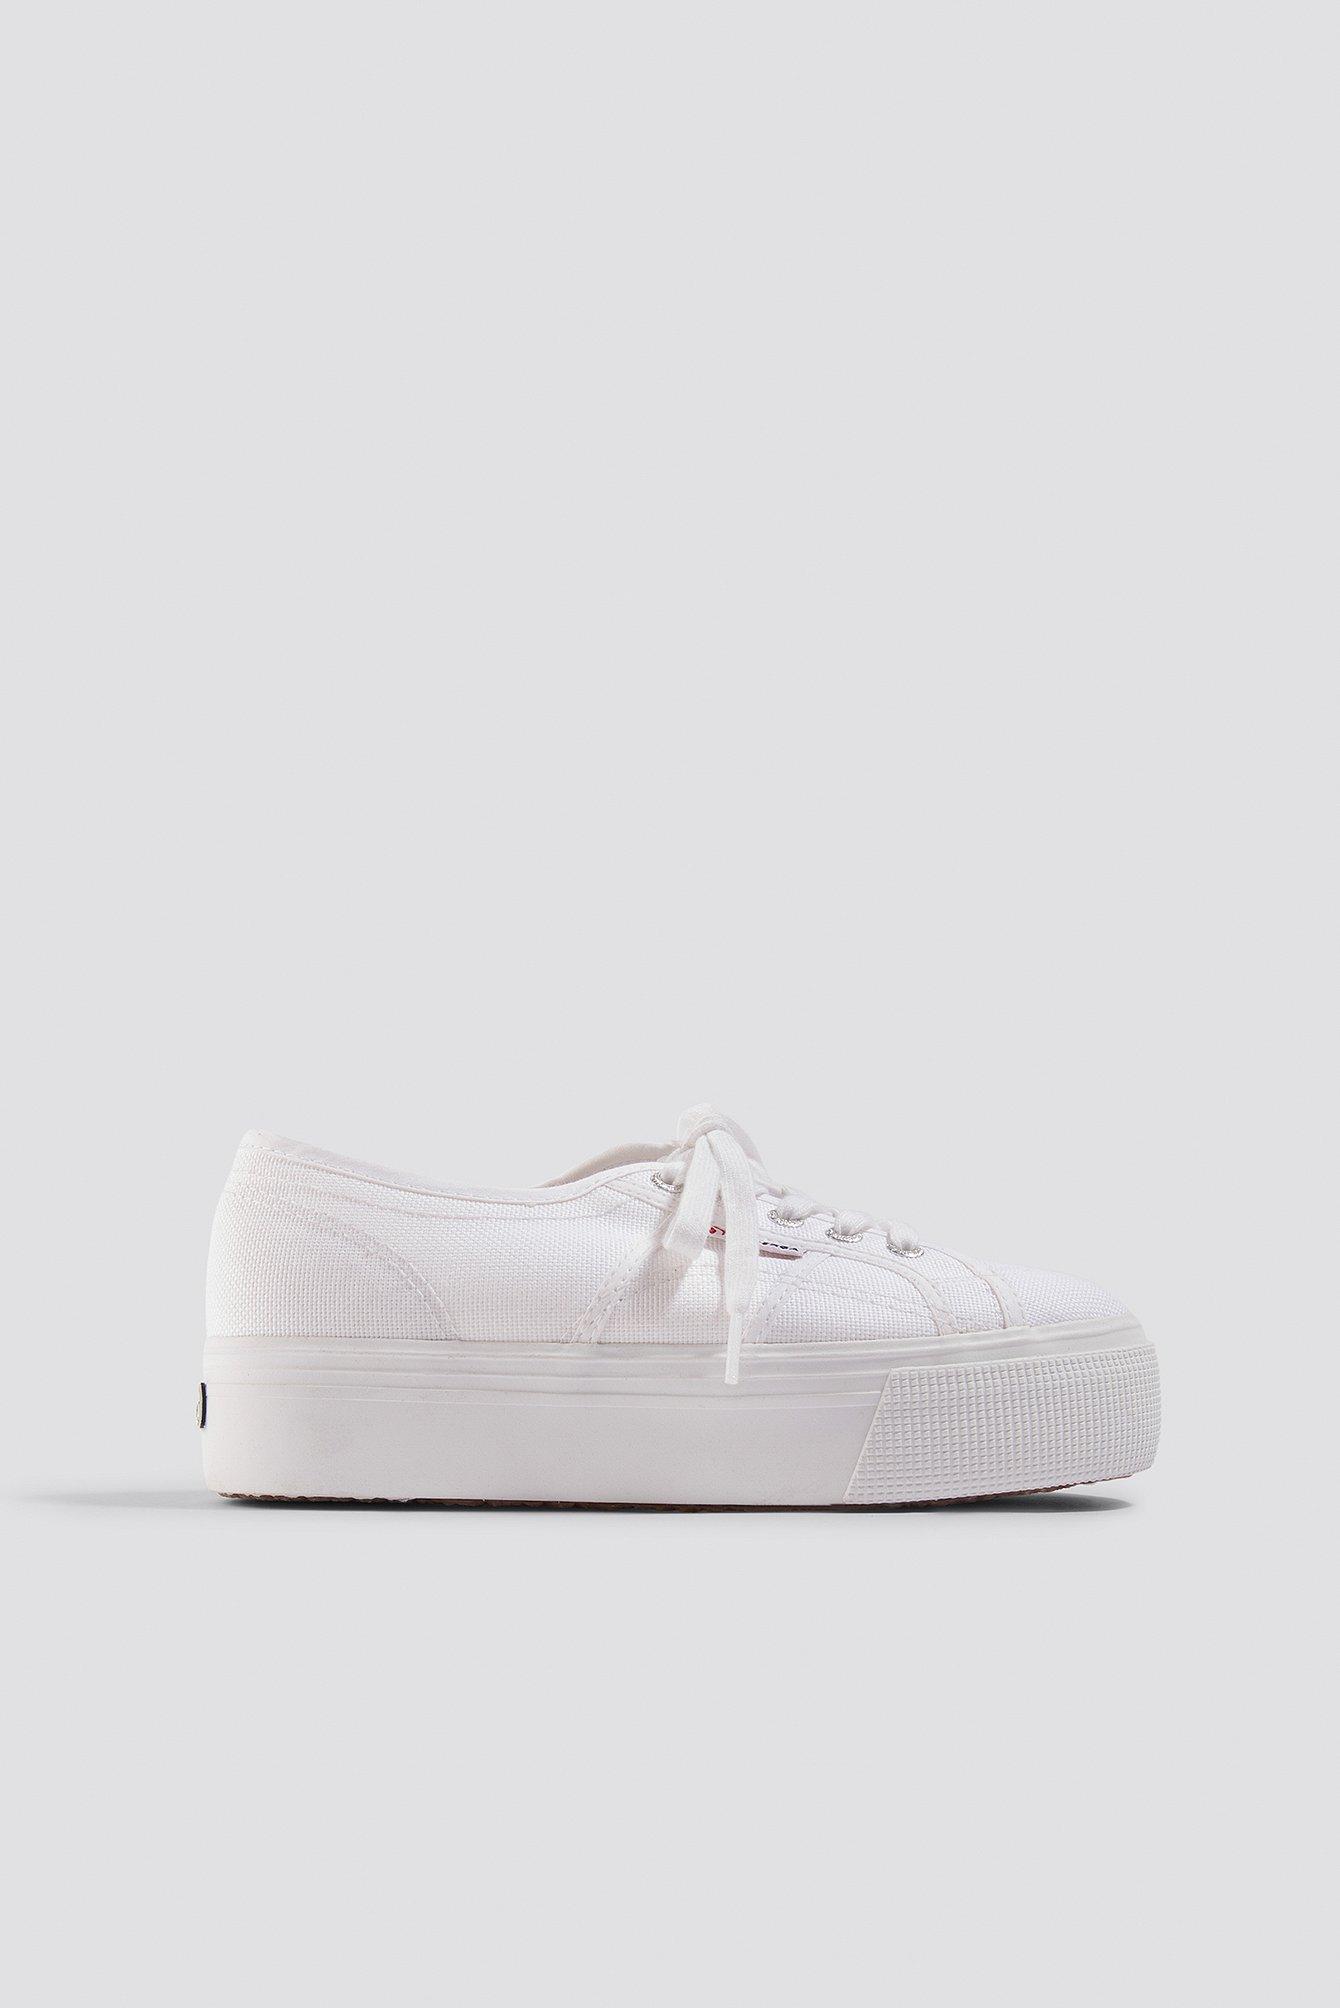 superga -  Acotw Linea 2790 - White